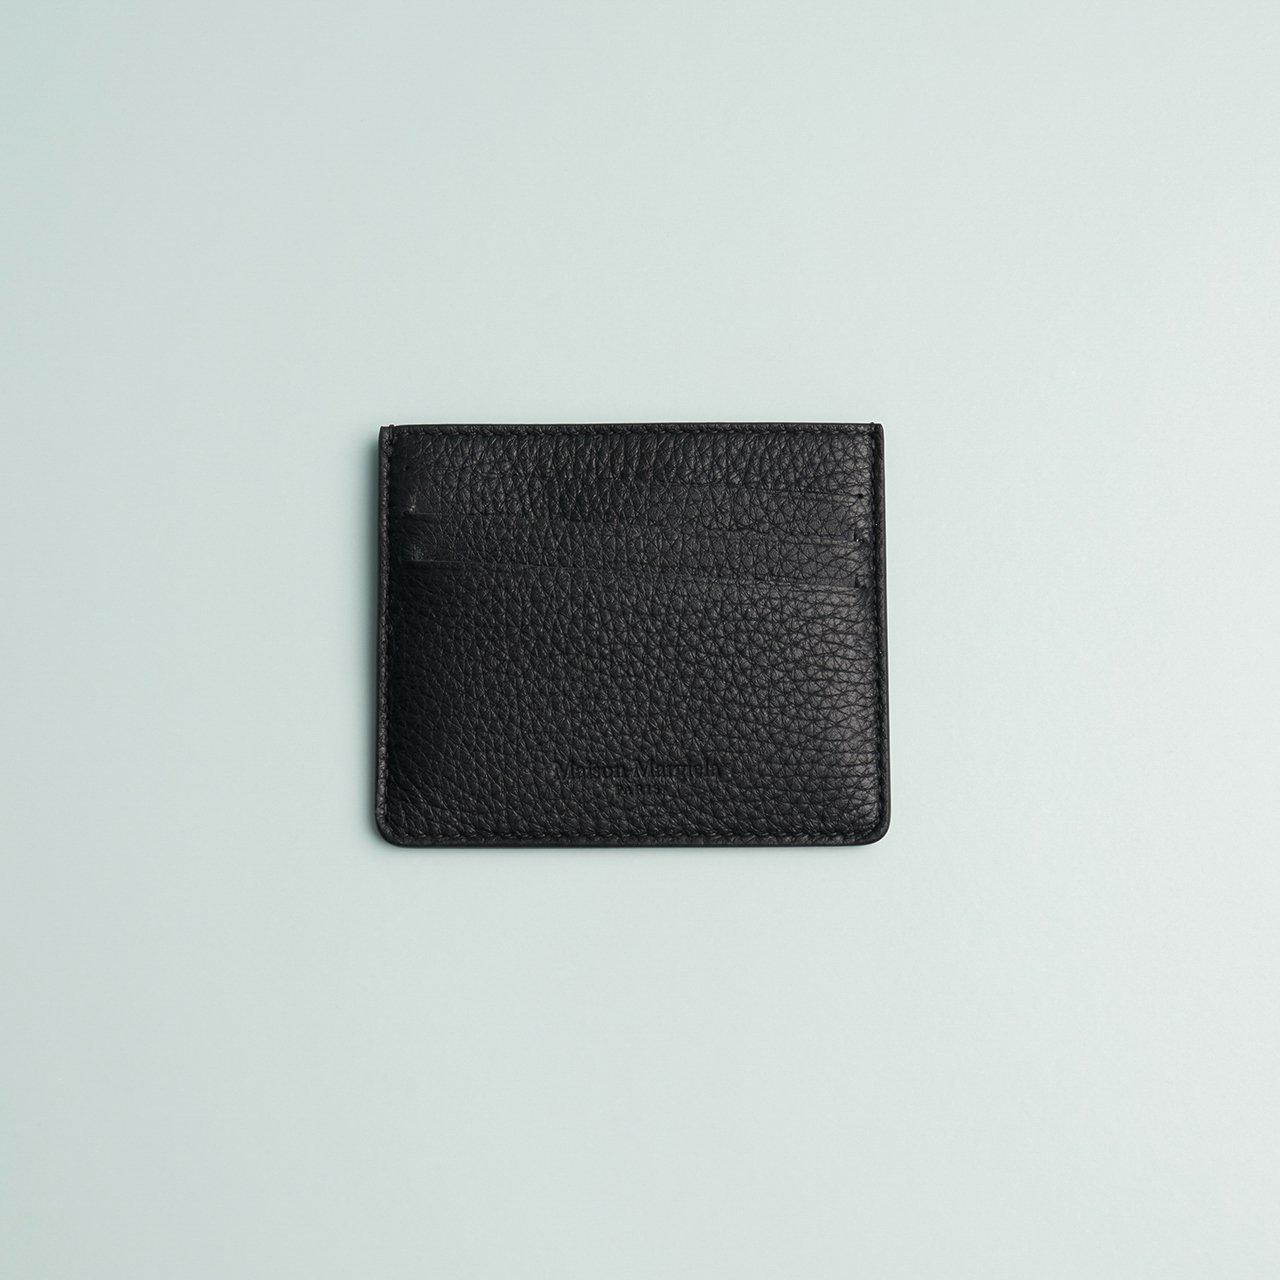 Maison Margiela PARIS <BR>カードケース <BR>ブラック